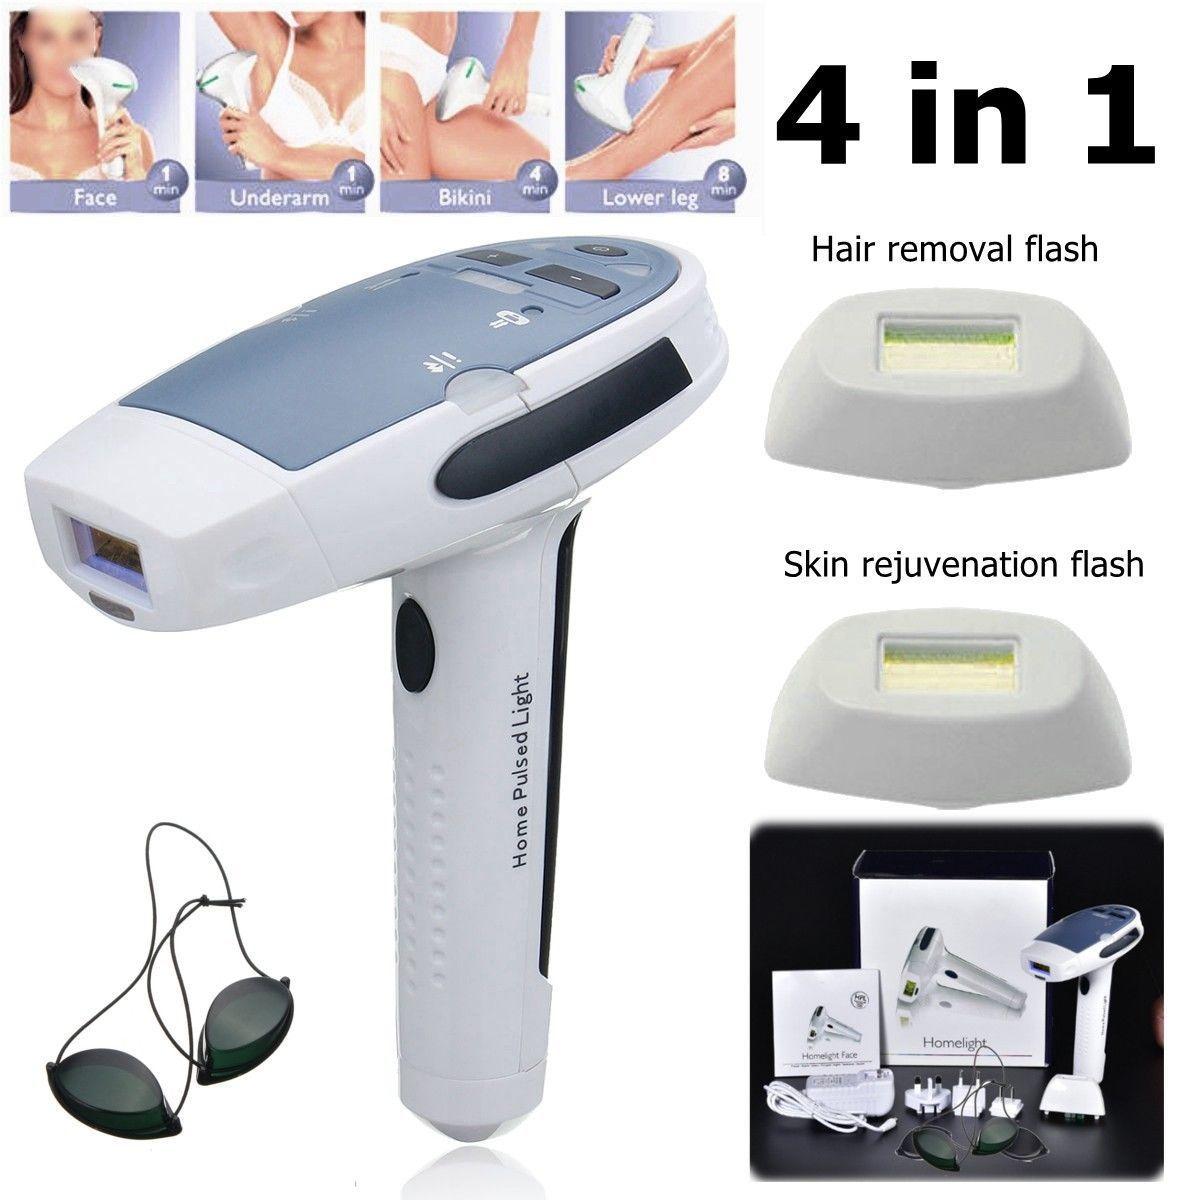 4 In1 IPL Permanent Laser Hair Removal Machine Full Body Epilator Home Use Remover Depilator Bikini Electric Trimmer Depilador